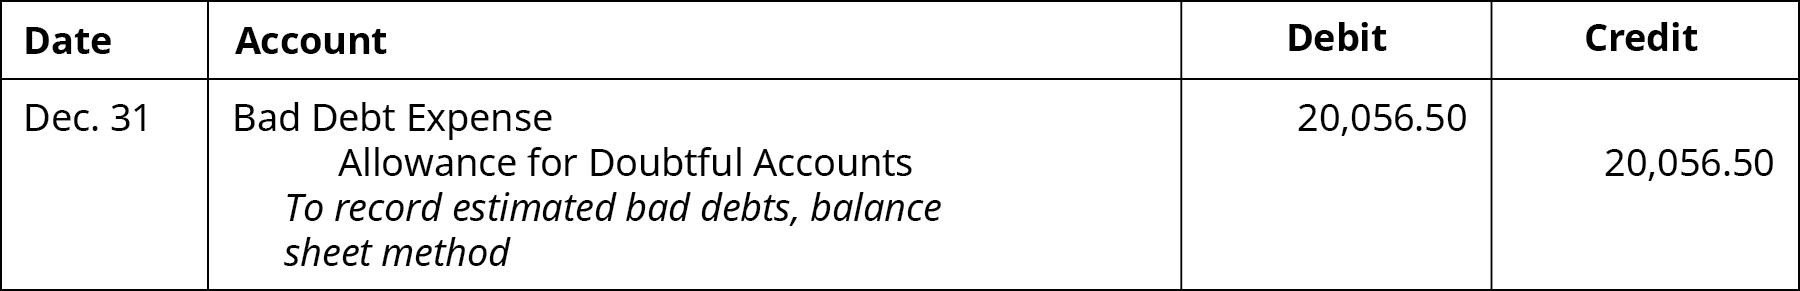 "Journal entry: December 31 Debit Bad Debt Expense 20,056.50, credit Allowance for Doubtful Accounts 20,056.50. Explanation: ""To record estimated bad debts, balance sheet method."""